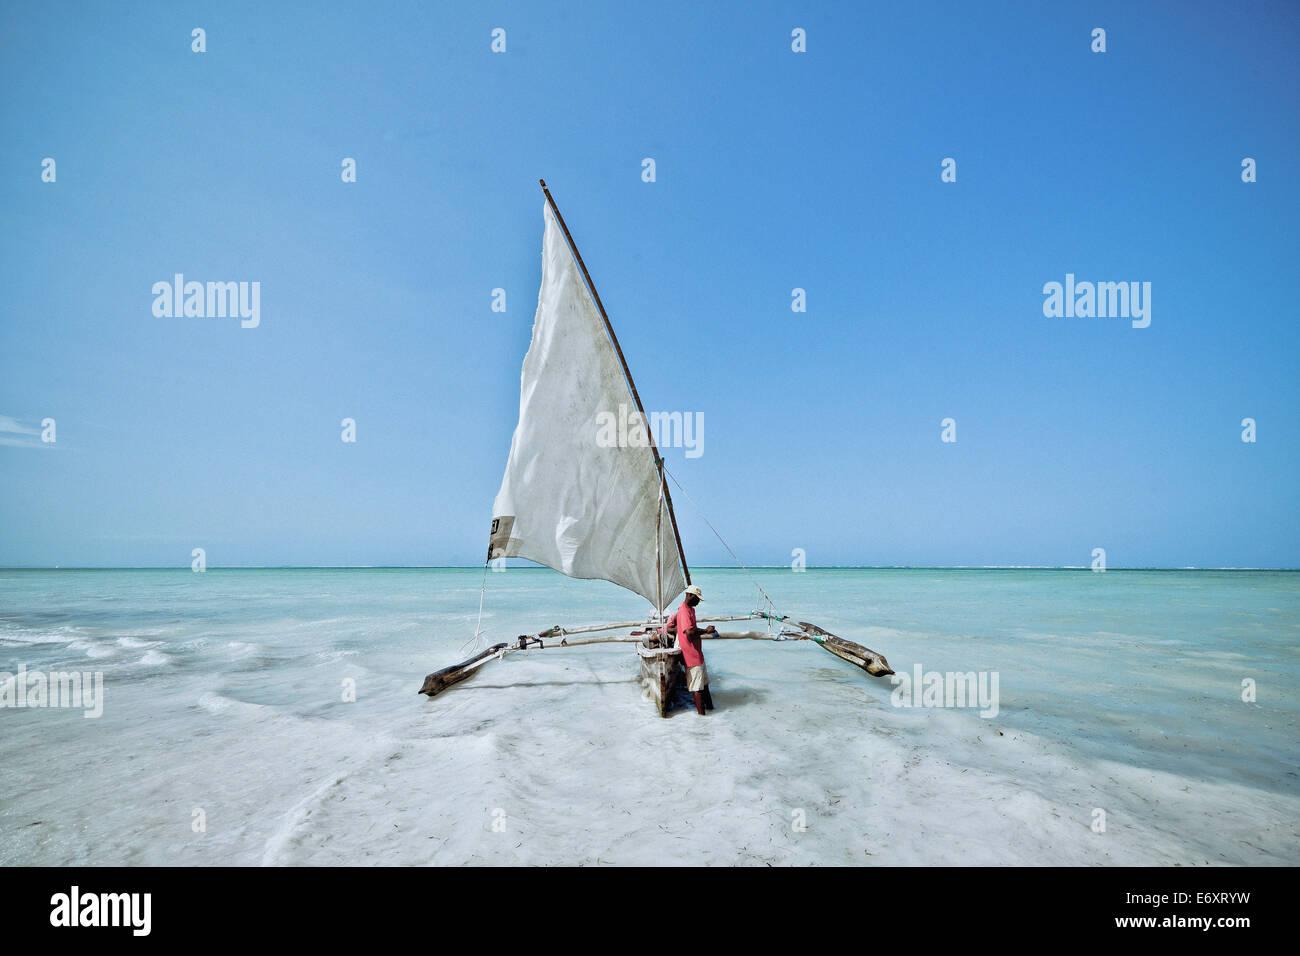 Dhow, traditional sailing boat, Zanzibar, Tanzania, Africa - Stock Image